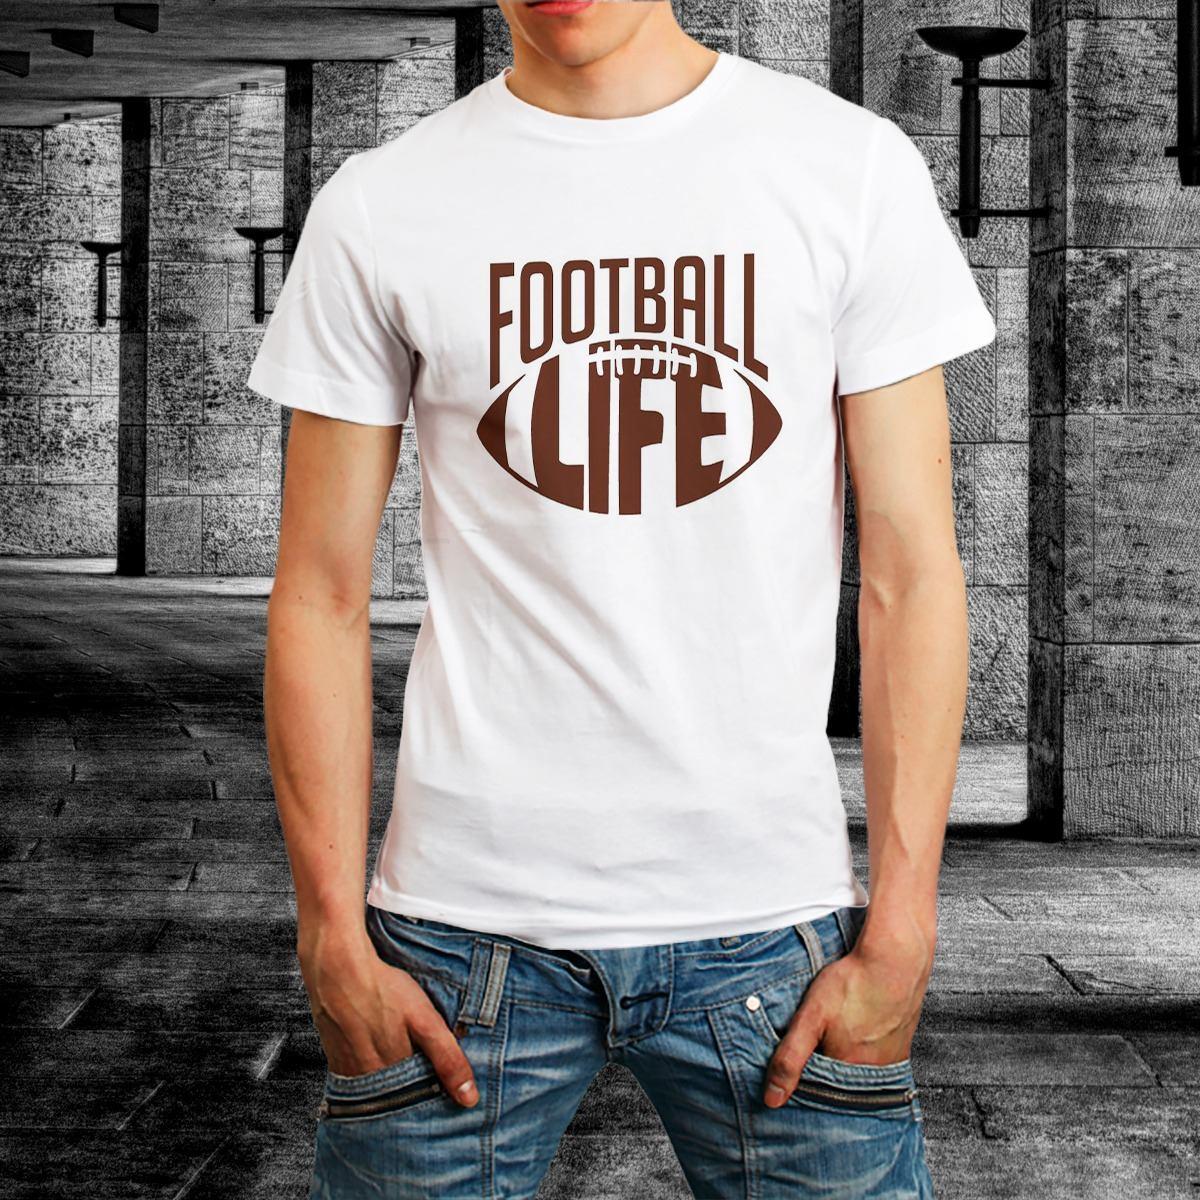 e8bdcd9638 camiseta futebol americano camisa football homem roupa. Carregando zoom.